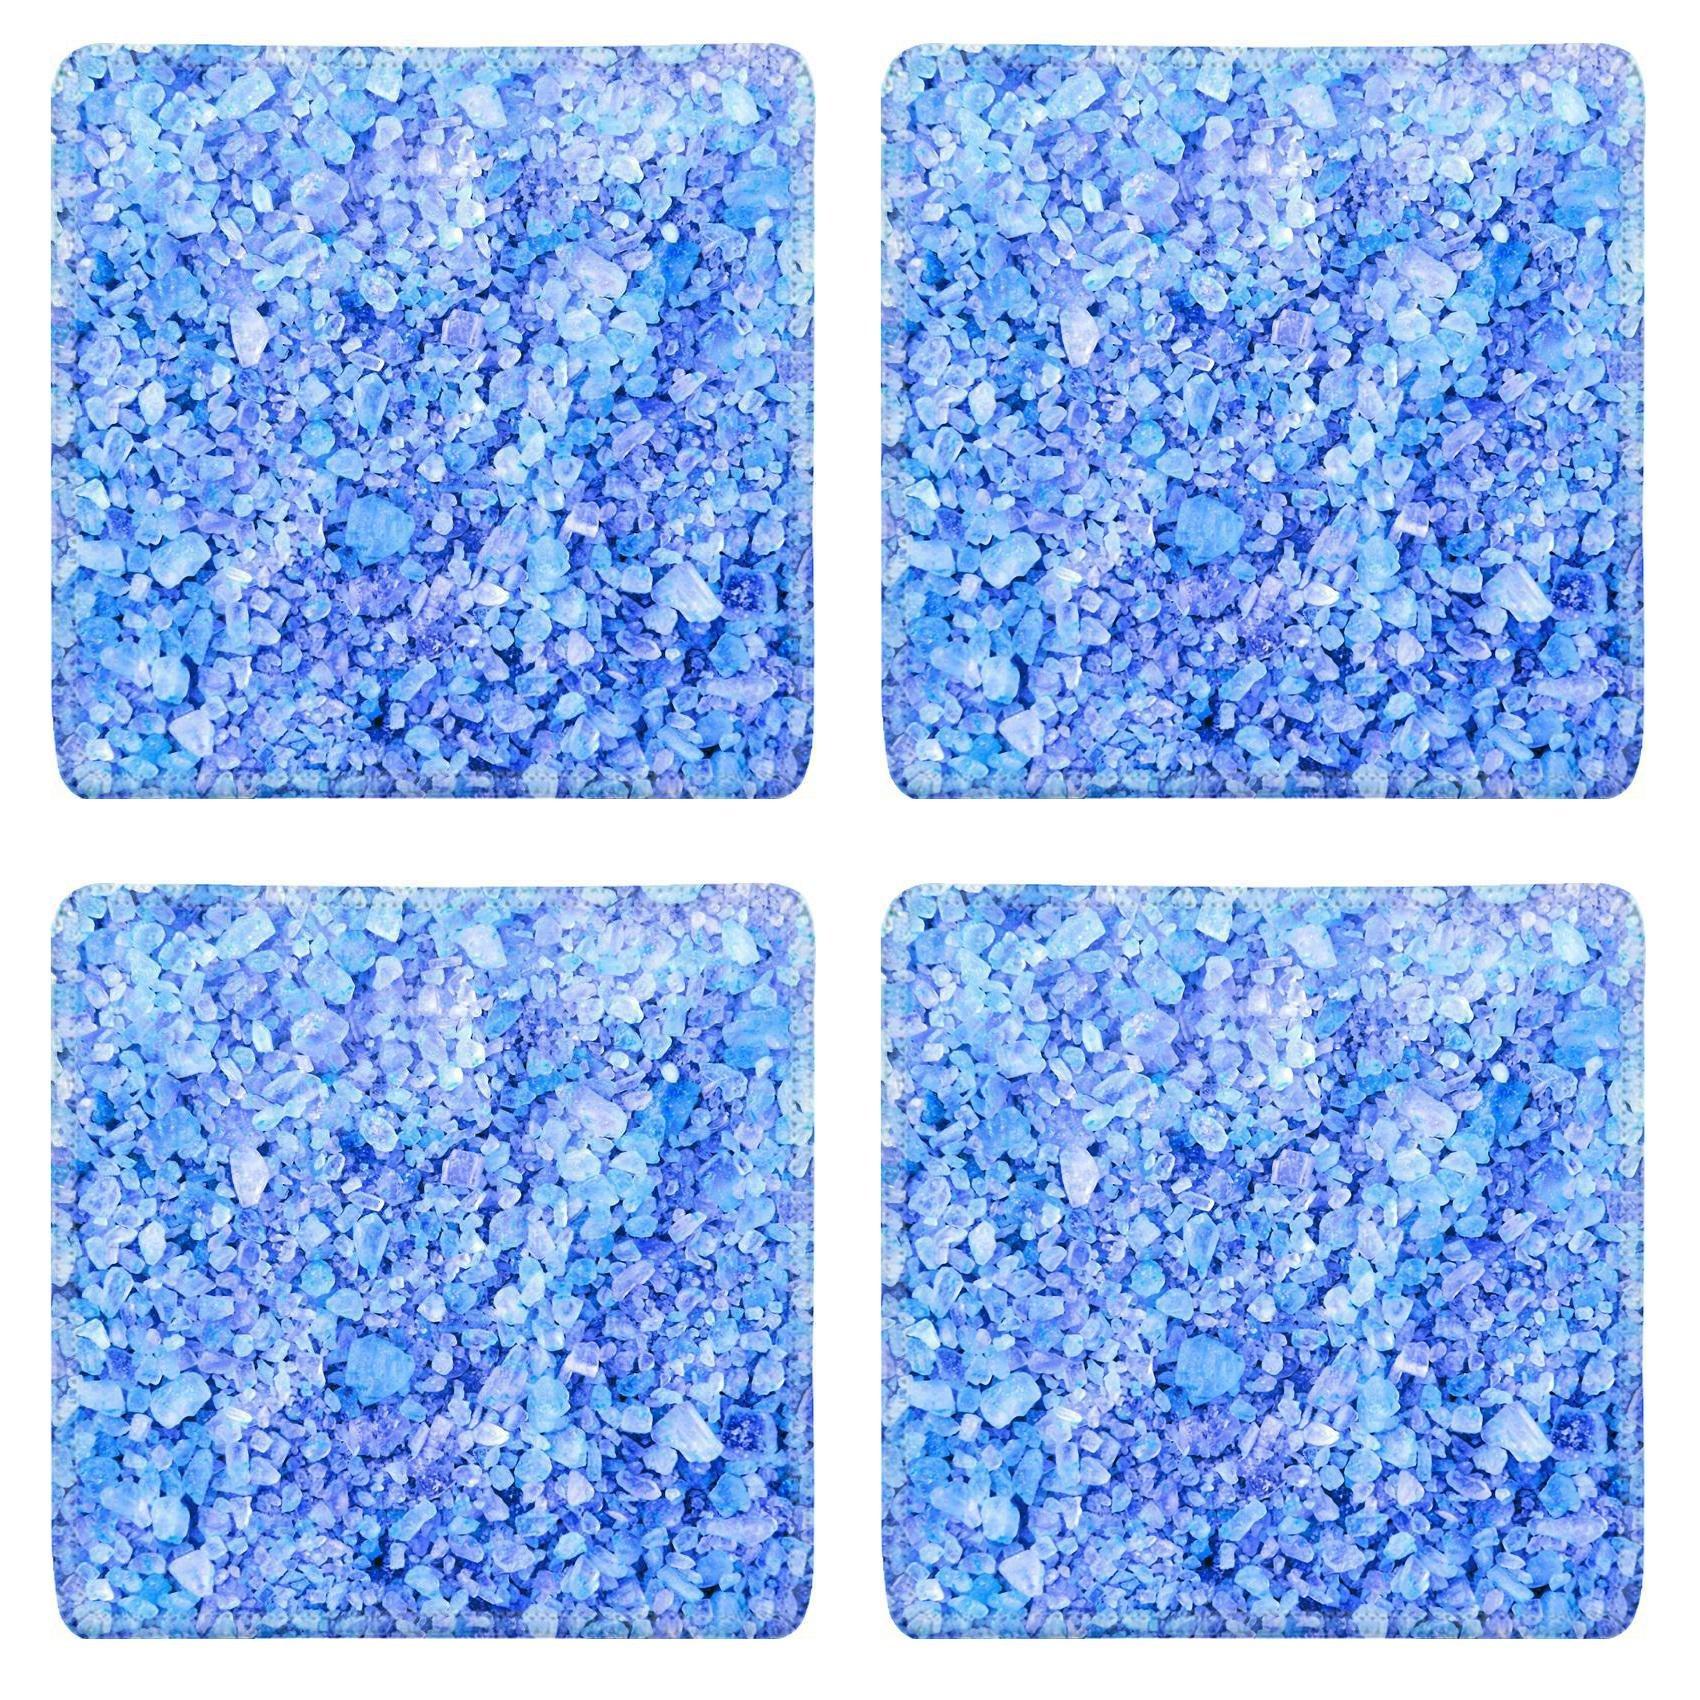 MSD Square Coasters Non-Slip Natural Rubber Desk Coasters design 24084396 spa blue crystals background texture macro